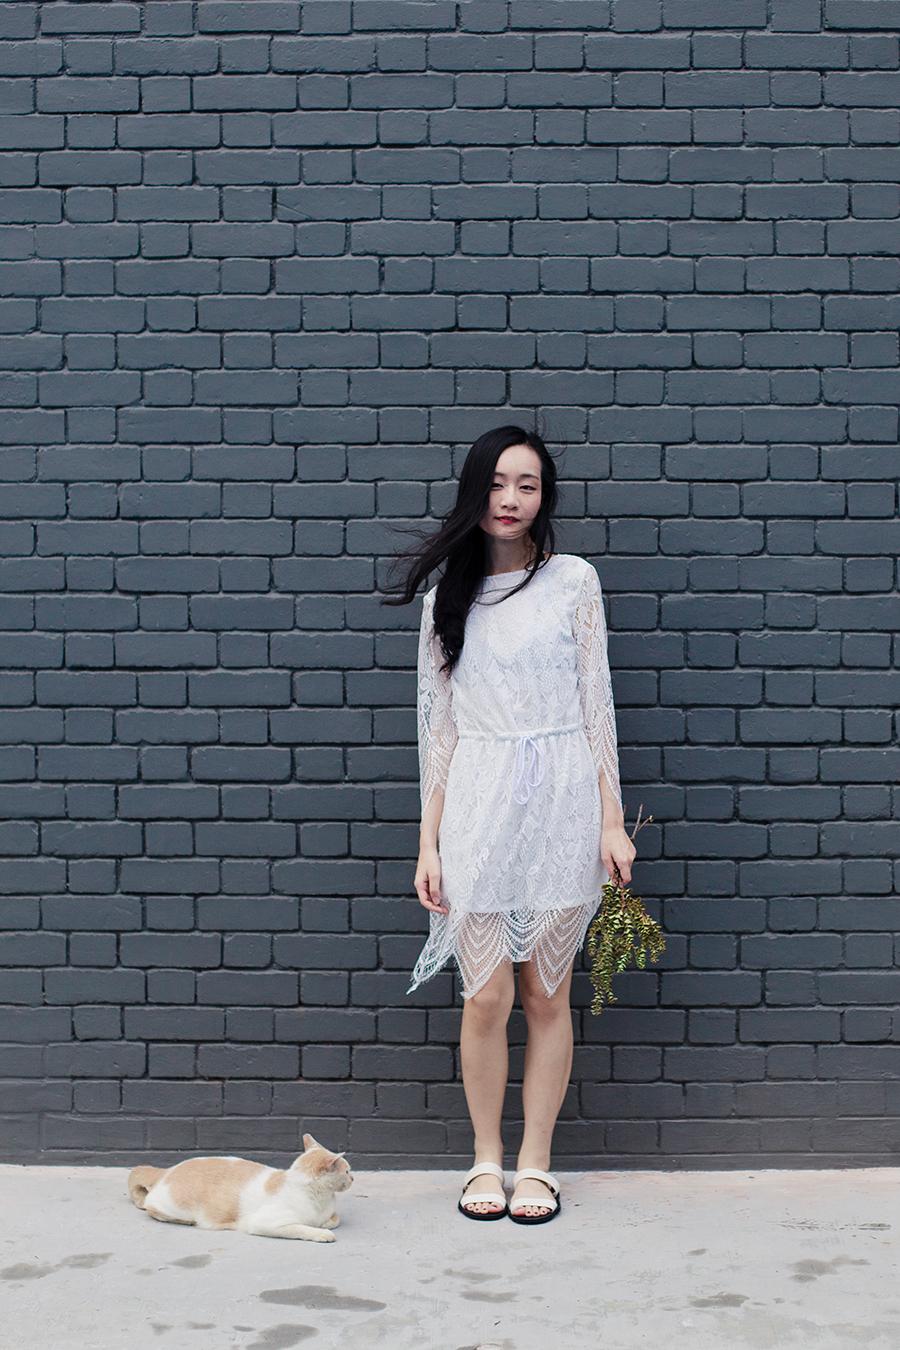 Dresslink white backless lace romper, Dresslink black strappy cutout bralette, BlackOut SG black and white sandals.